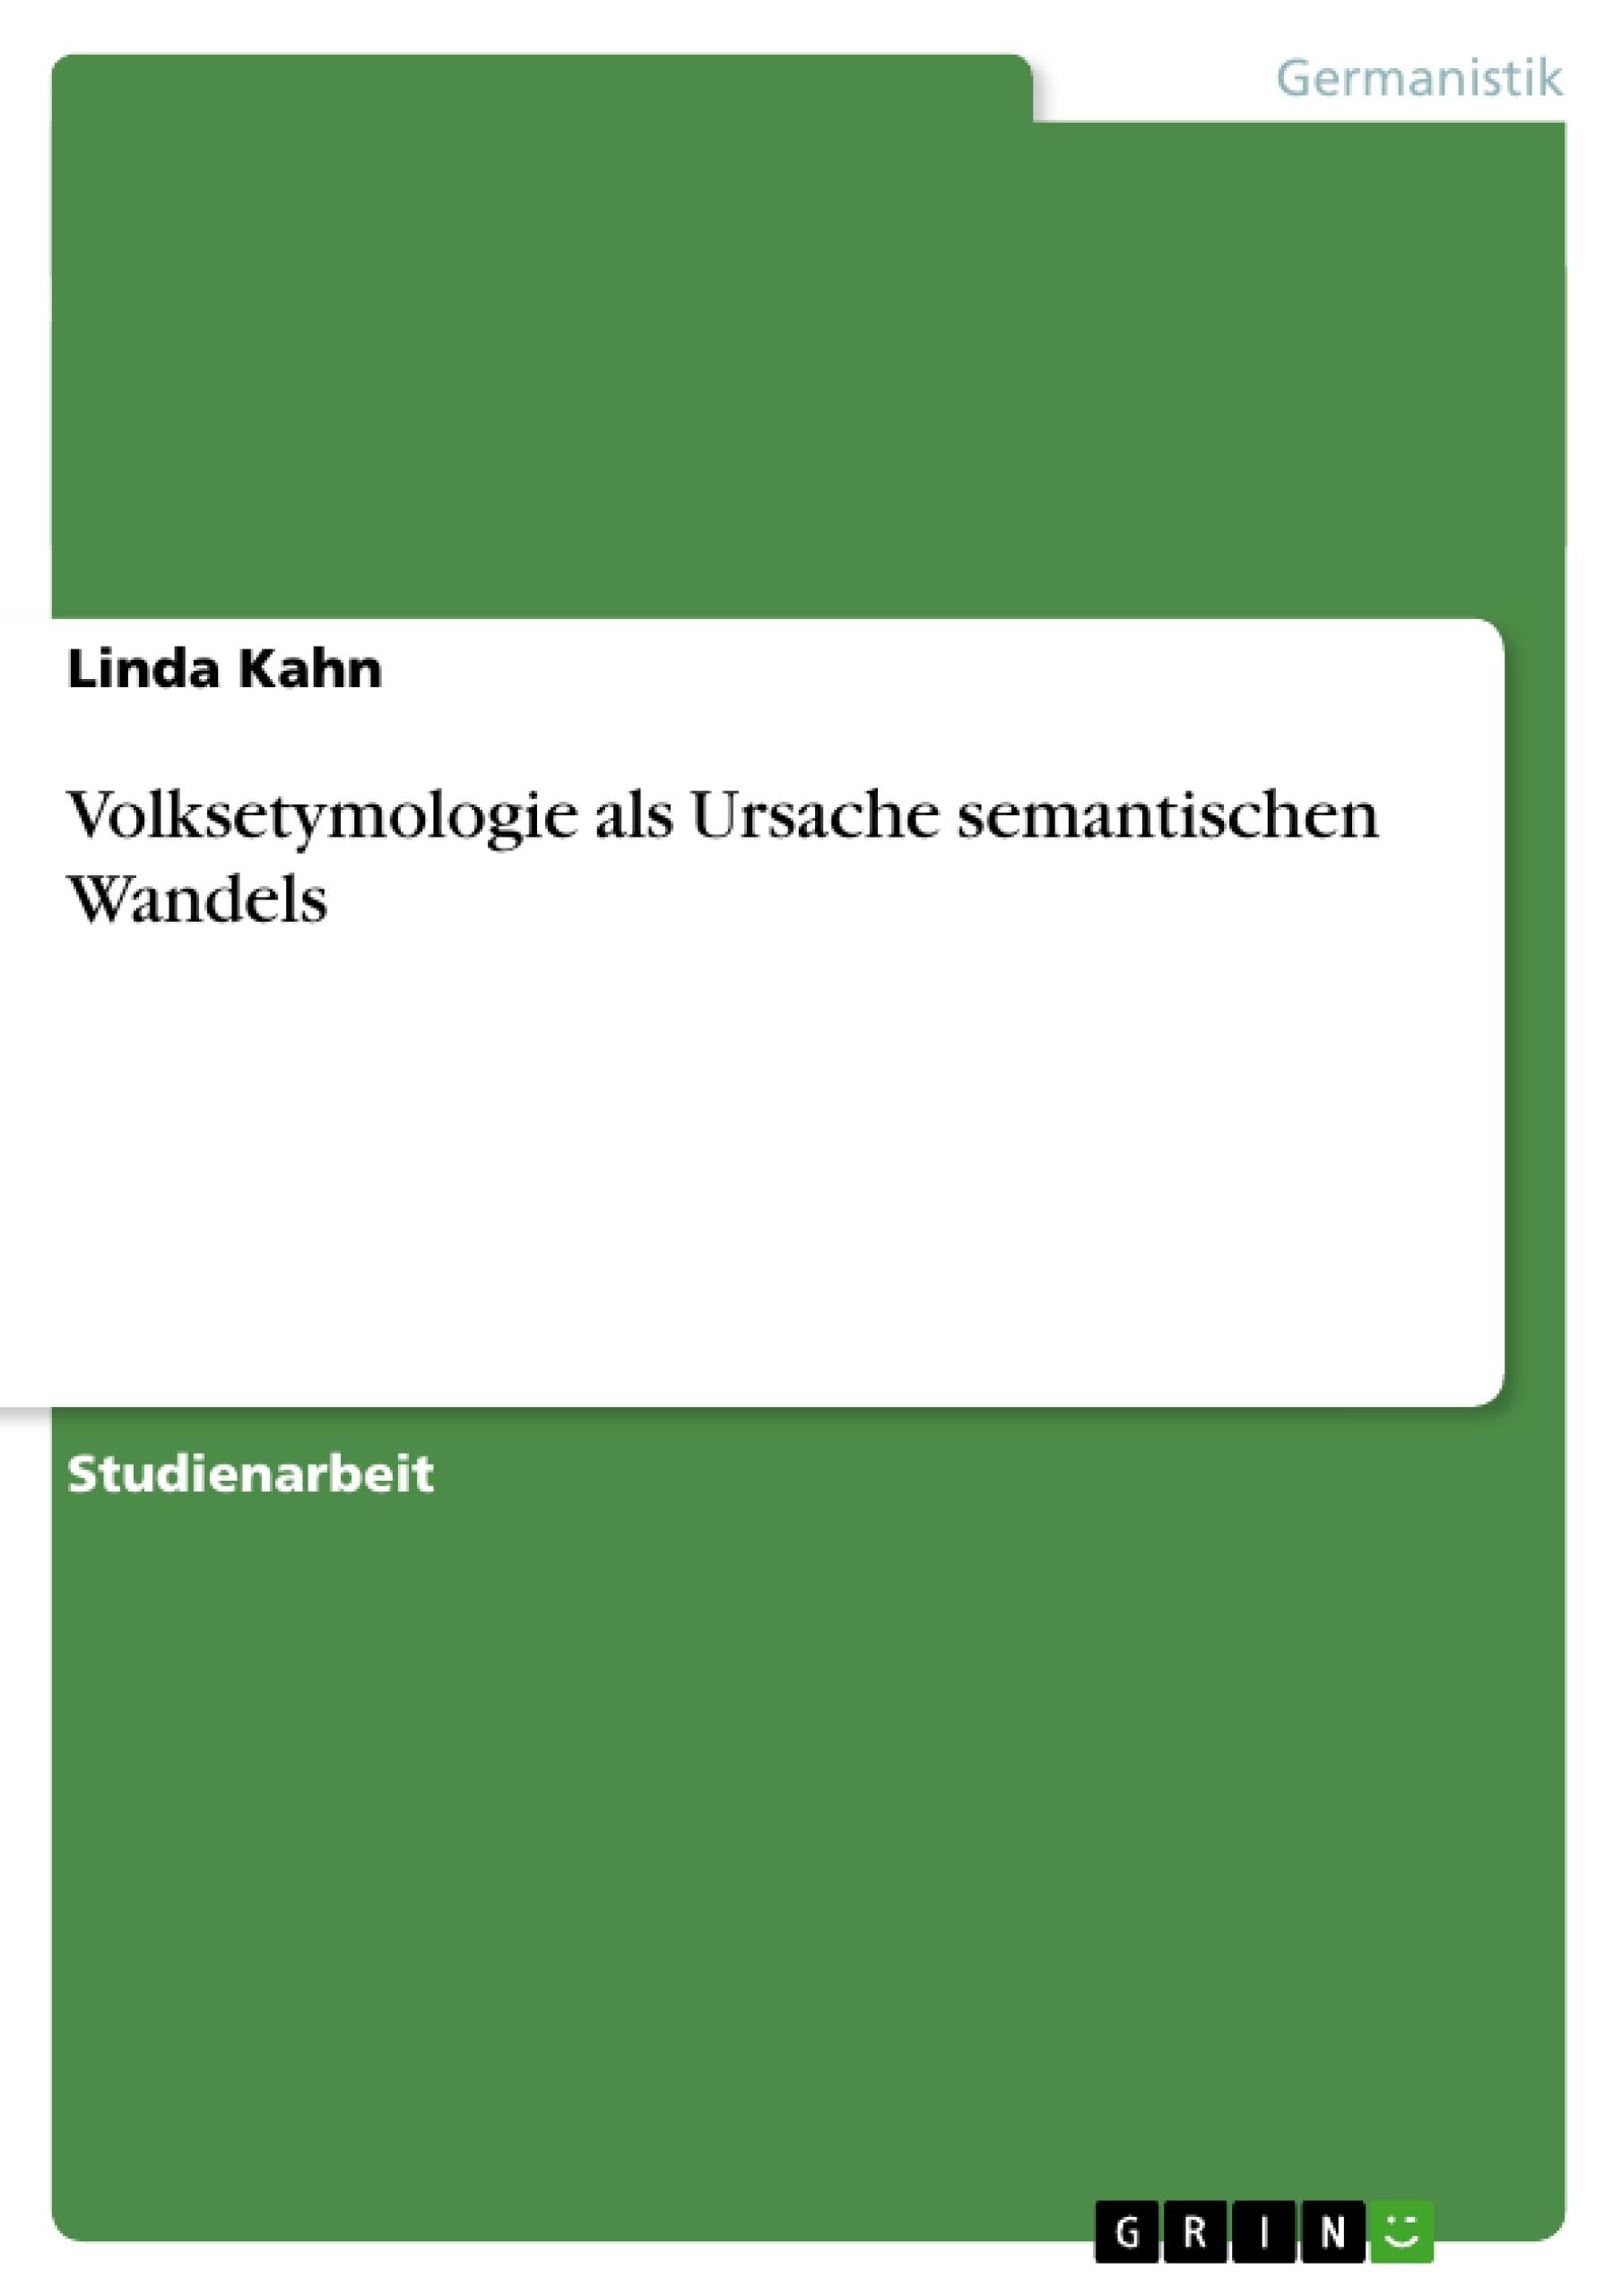 Titel: Volksetymologie als Ursache semantischen Wandels